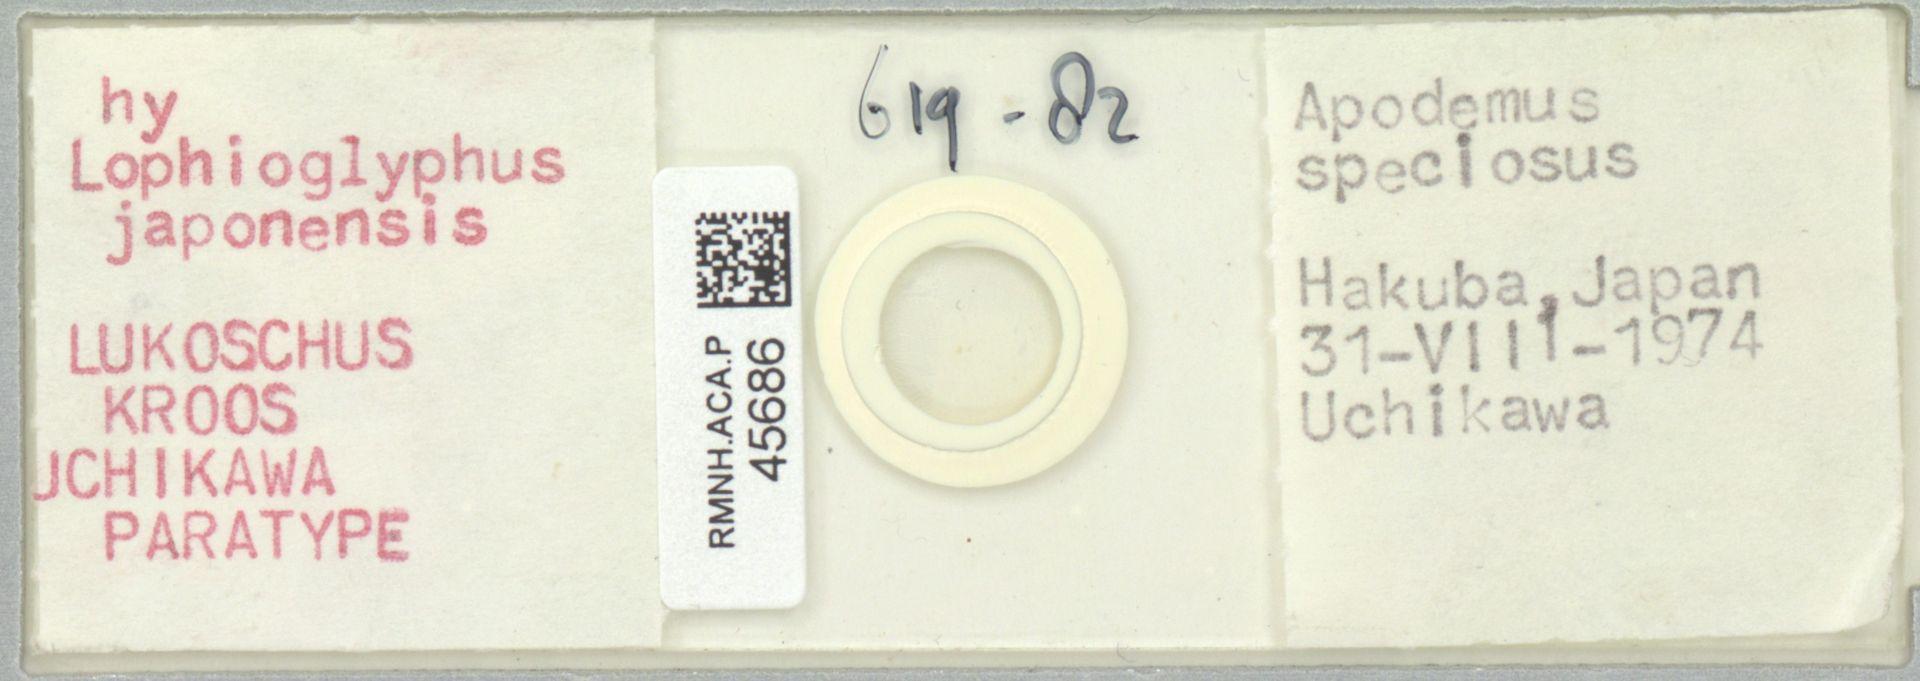 RMNH.ACA.P.45686   Lophioglyphus japonensis Lukoschus, Kroos, Uchikawa